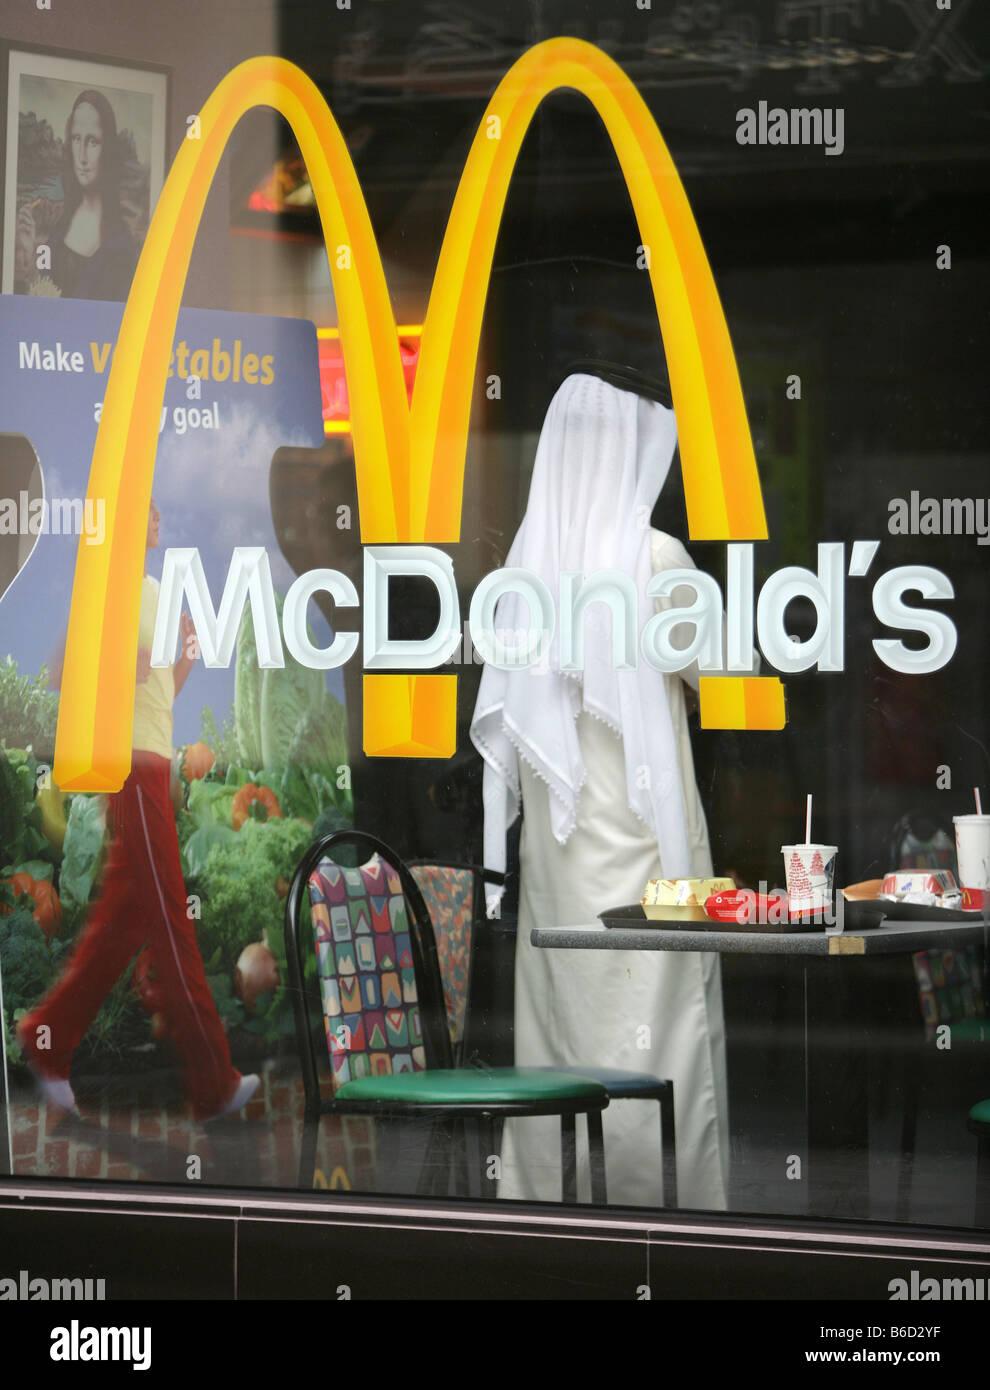 BRN, Bahrain: Manama, McDonalds Restaurant - Stock Image